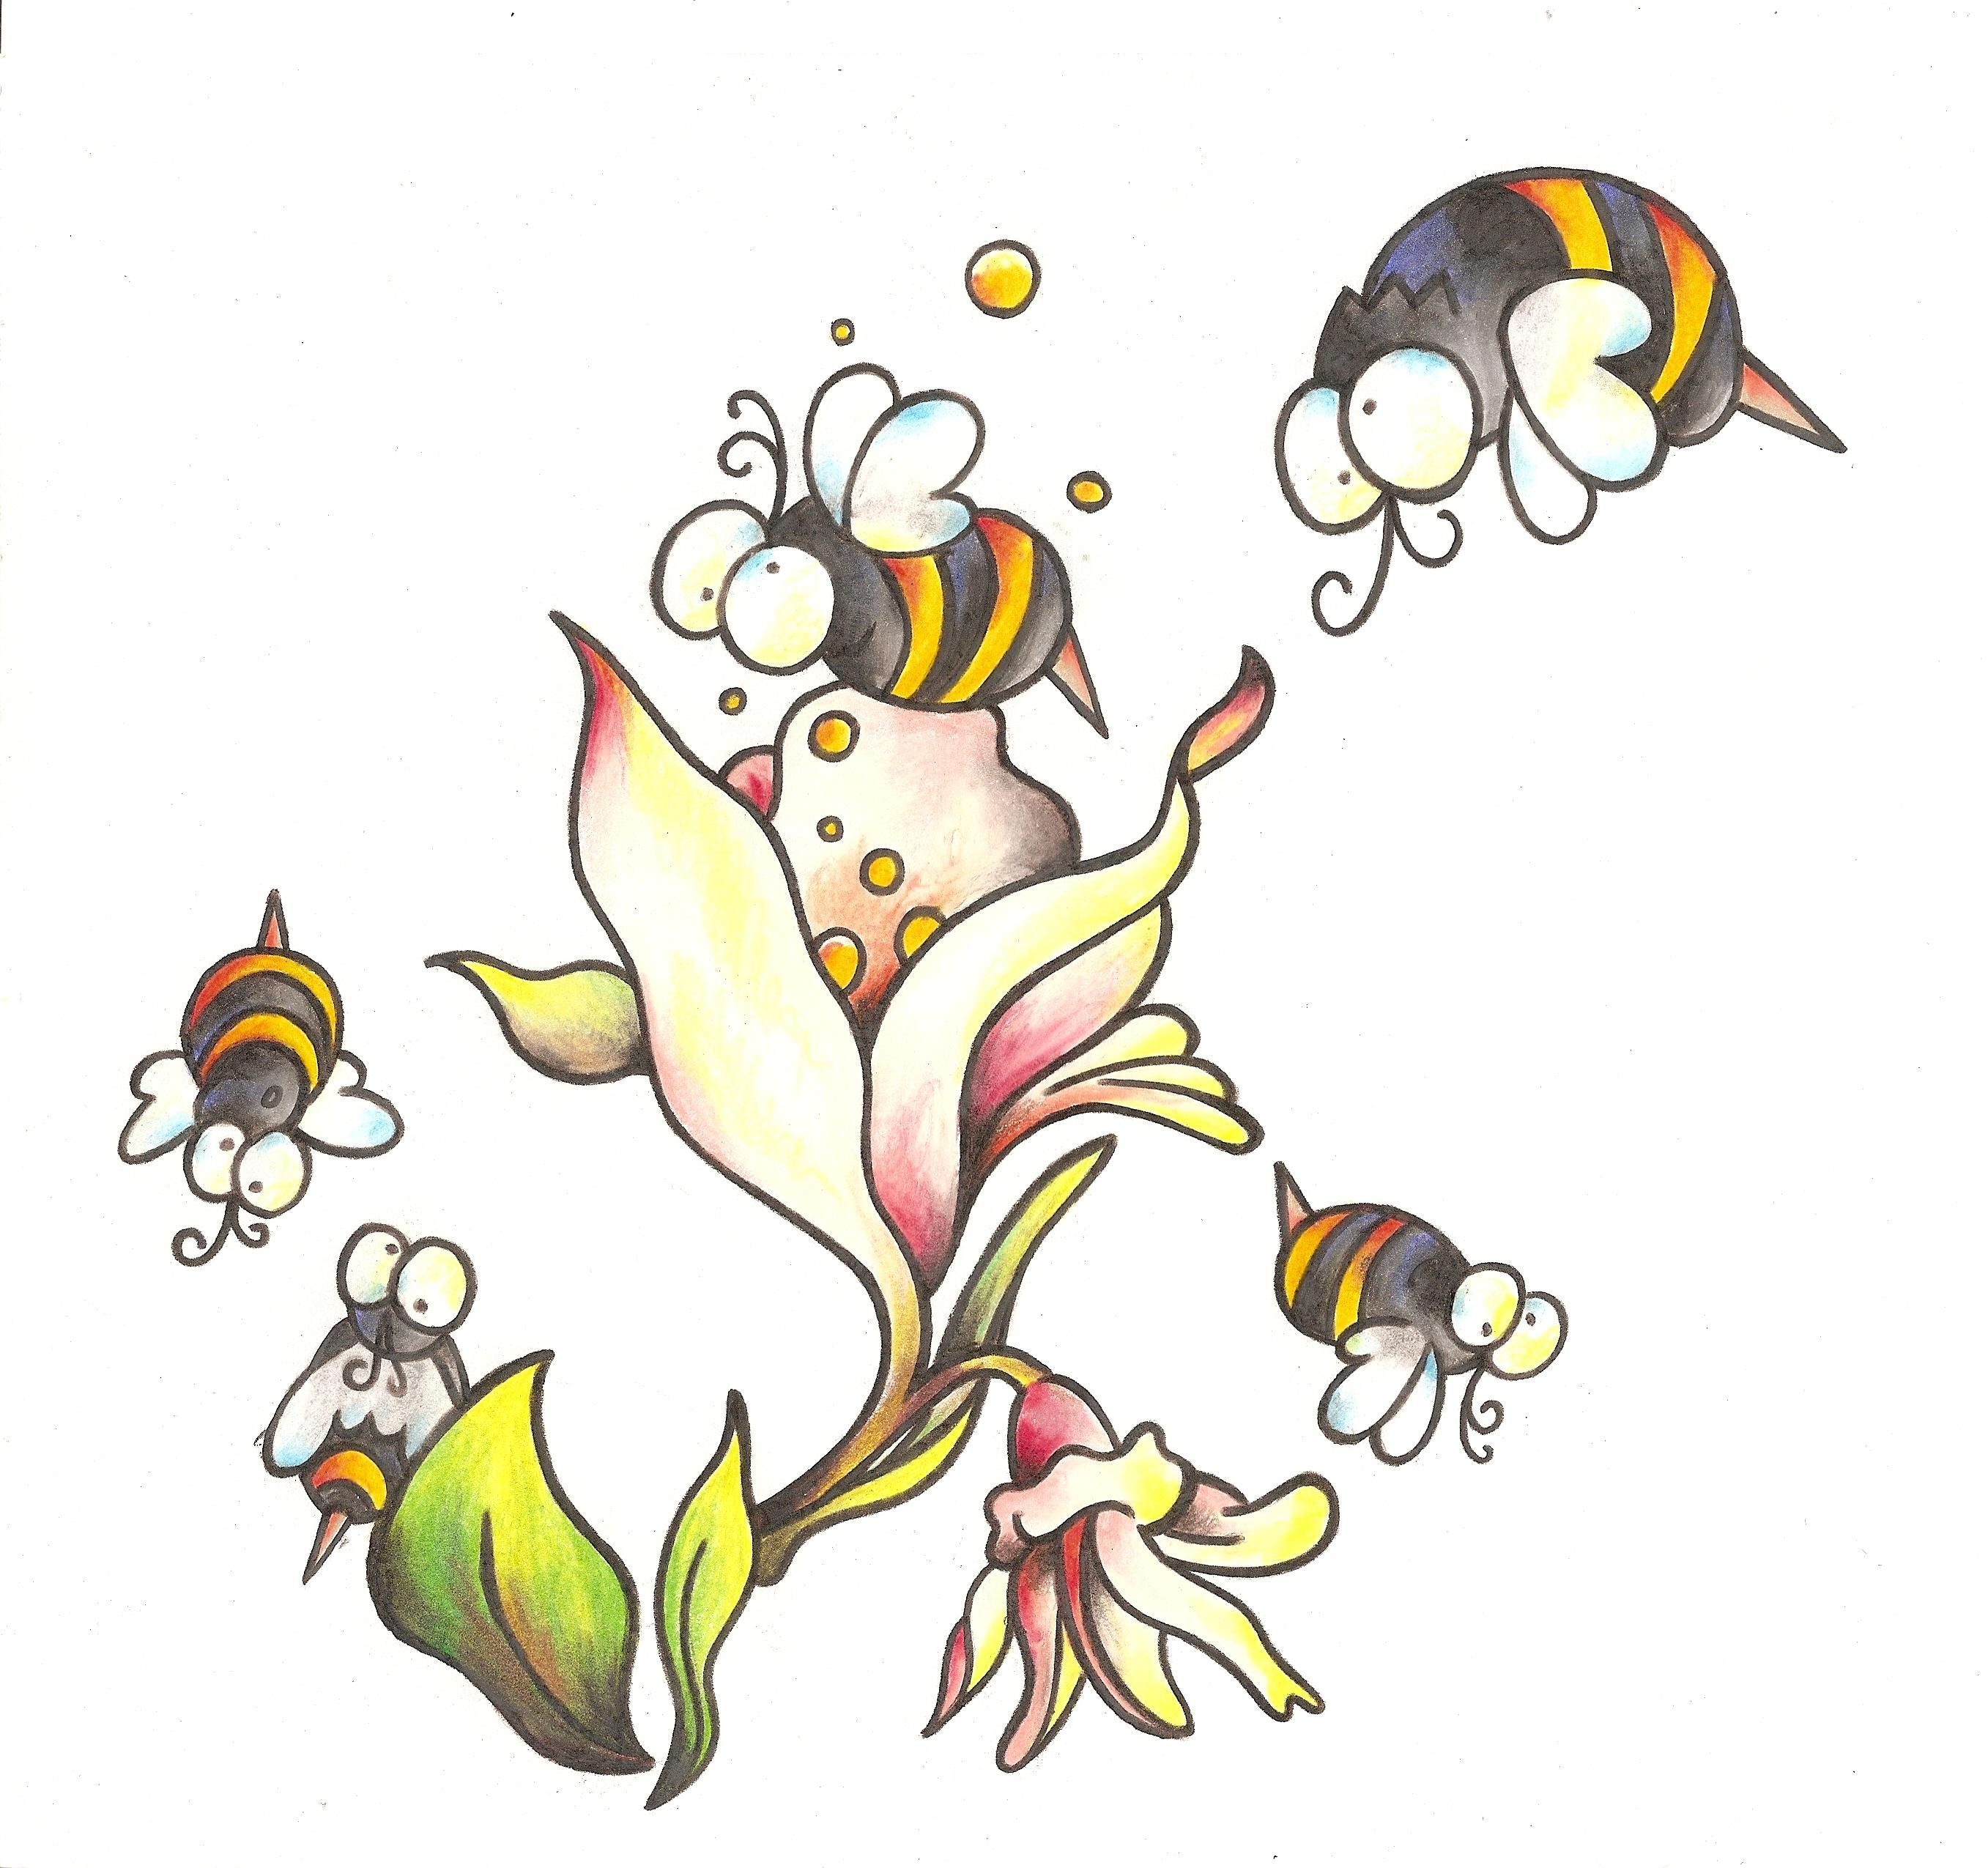 Bumbóg